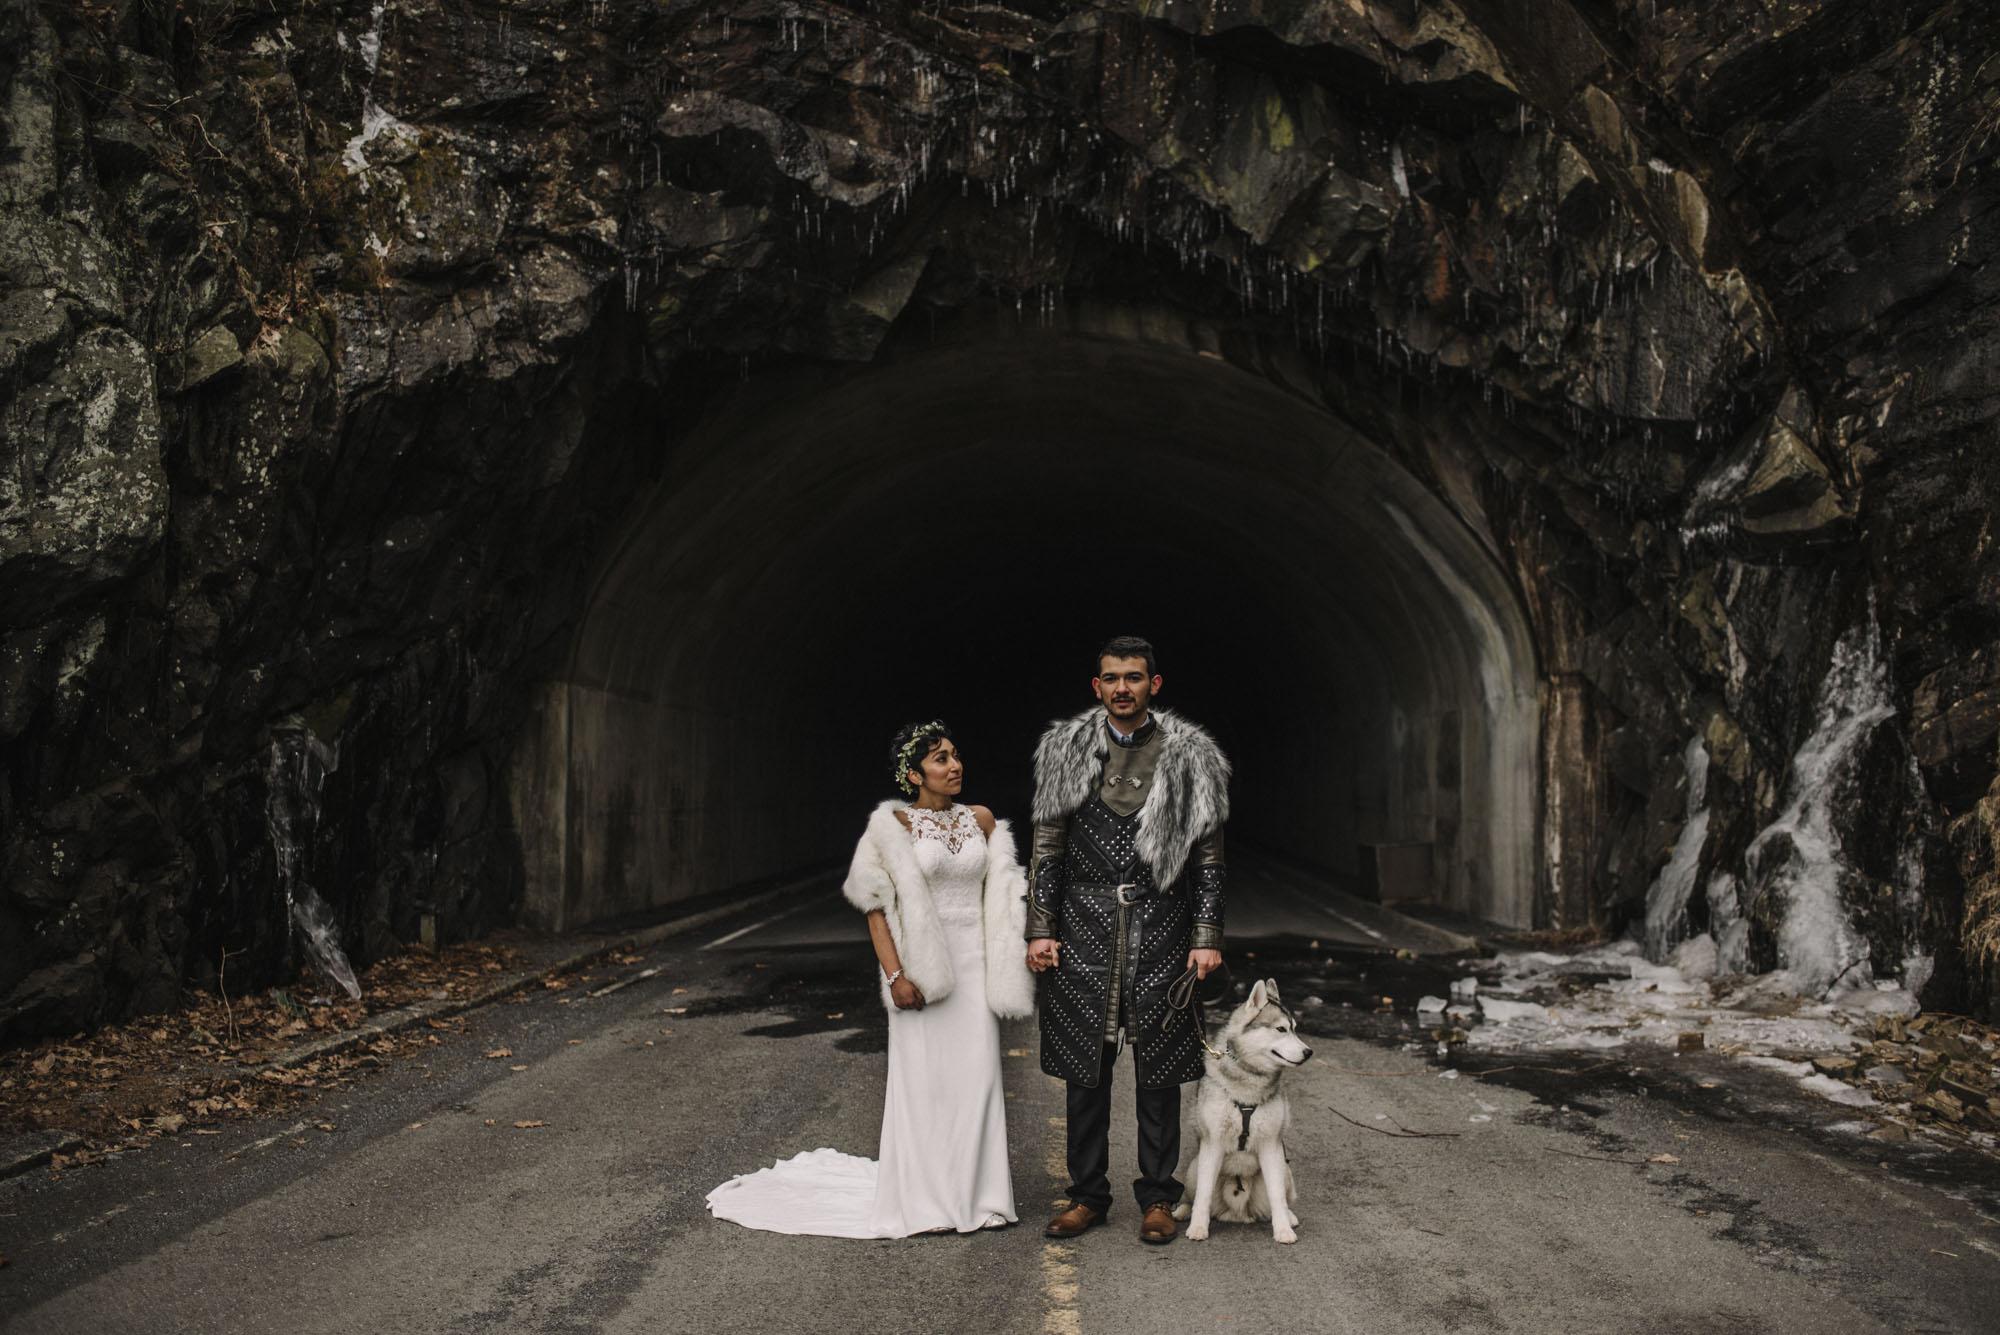 Game of Thrones Elopement - Winter Elopement - Shenandoah National Park Elopement Photographer - Virginia Adventure Photographer - Blue Ridge Parkway Elopement Photographer_27.jpg